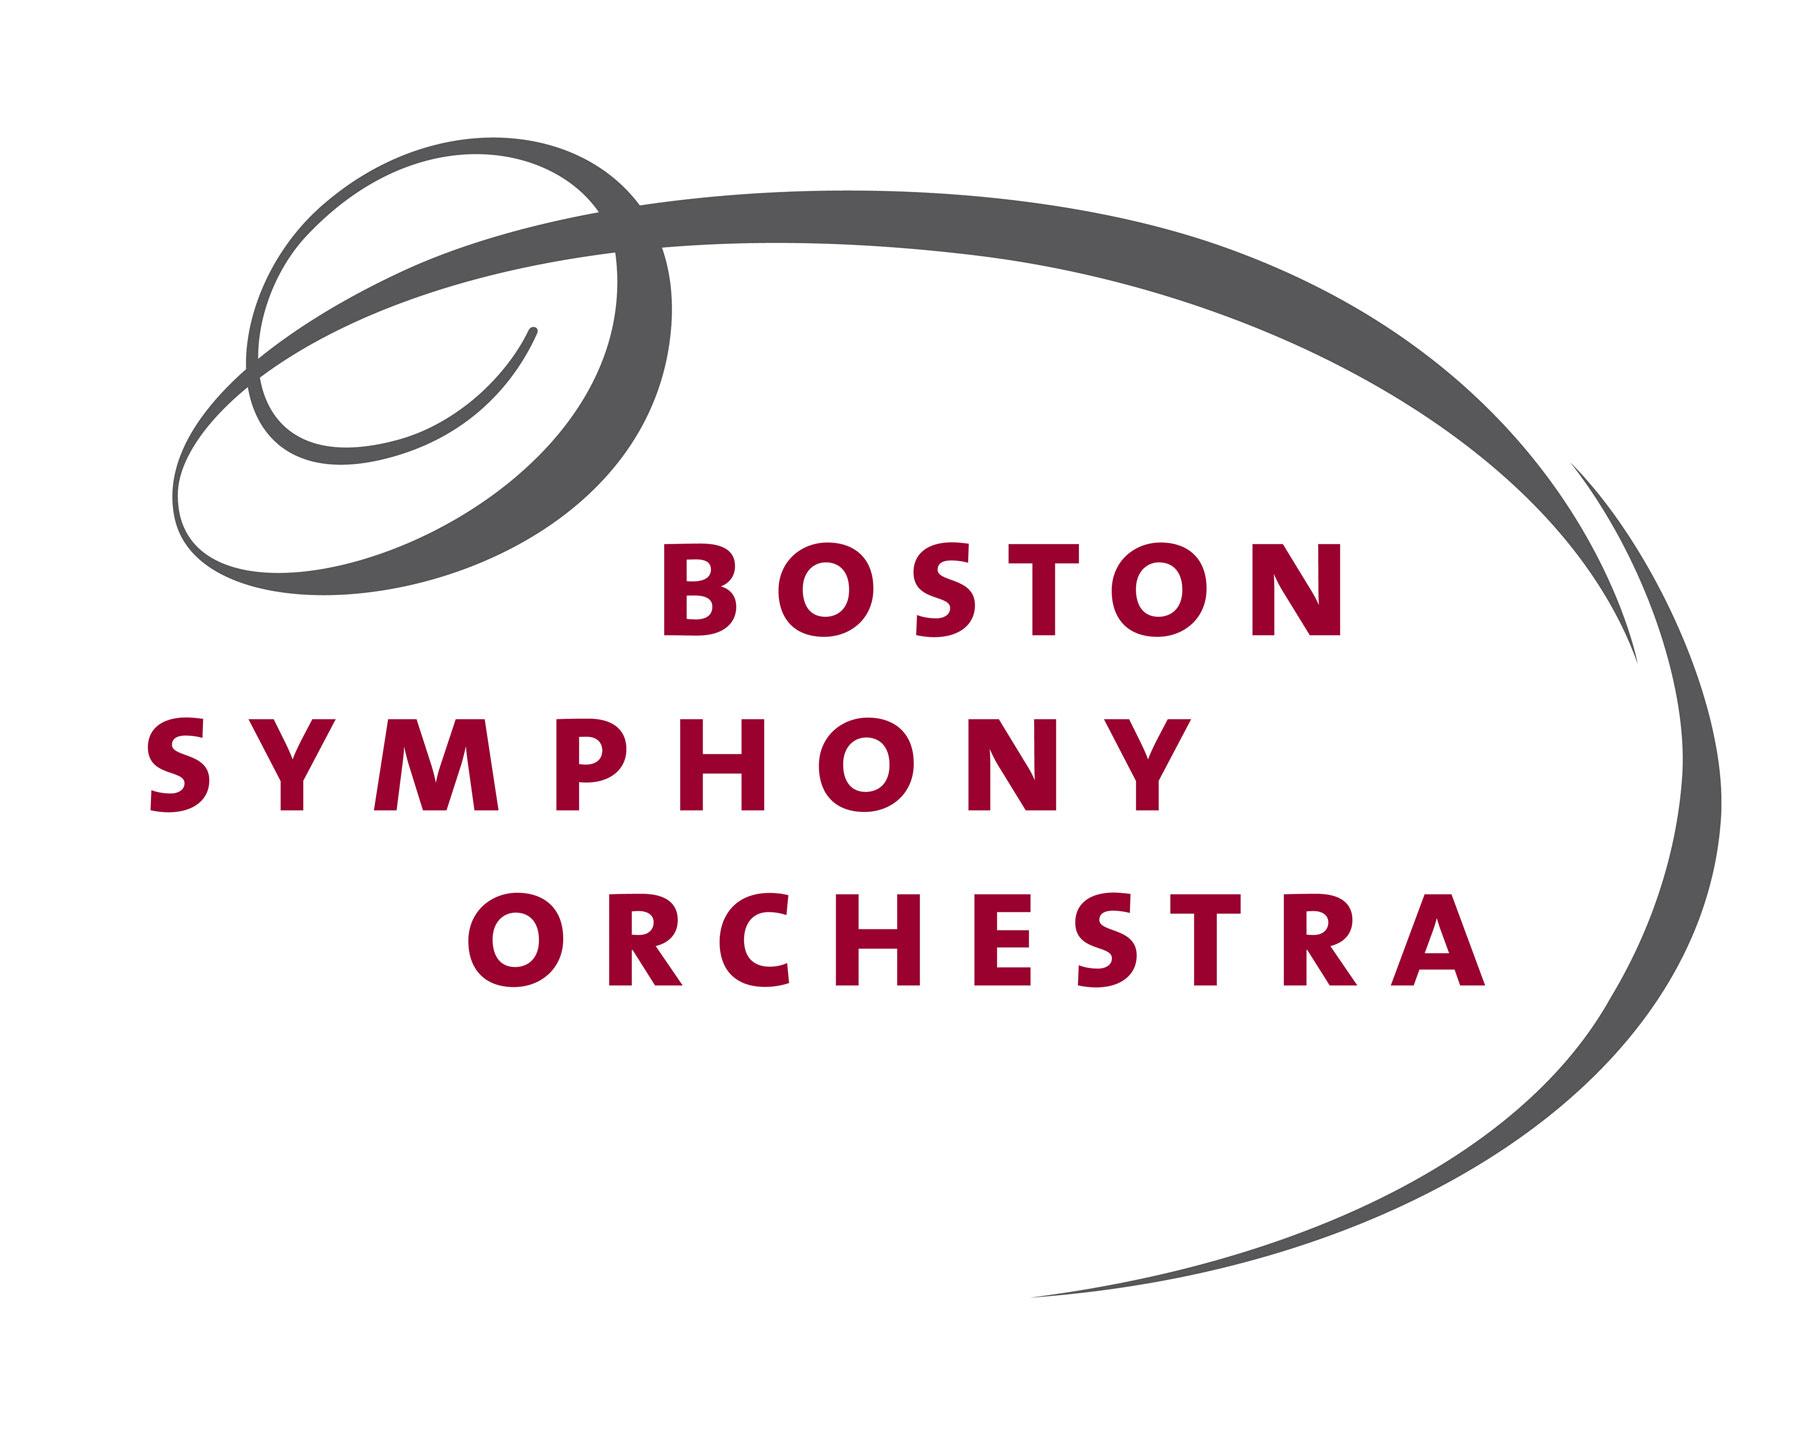 Boston Symphony Orchestra Concert [01/07/17]